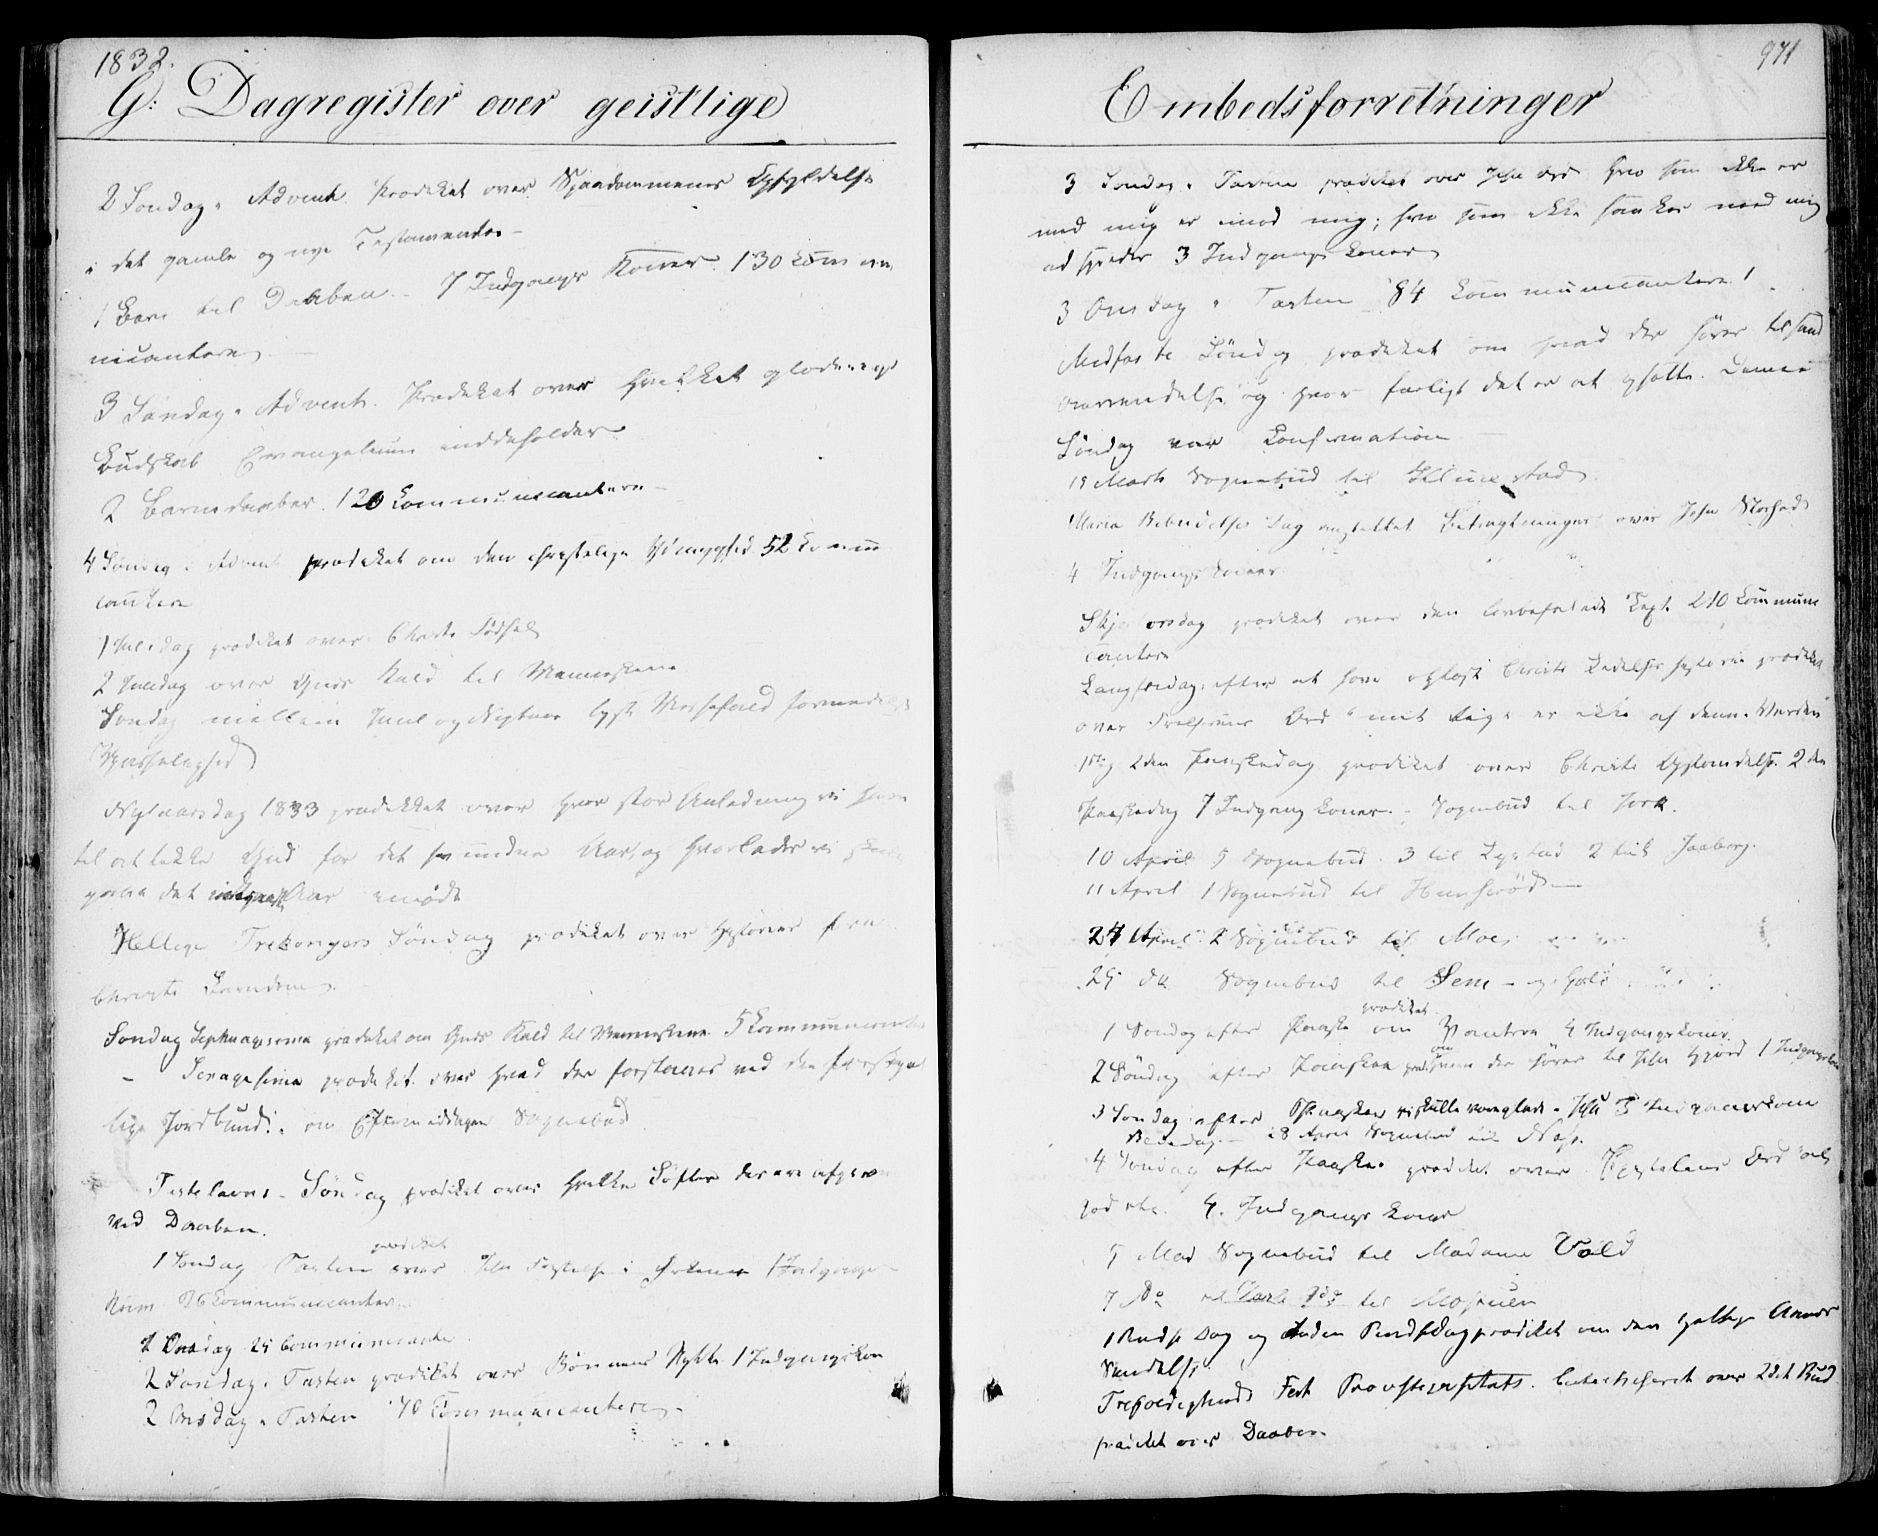 SAKO, Sandar kirkebøker, F/Fa/L0005: Parish register (official) no. 5, 1832-1847, p. 970-971